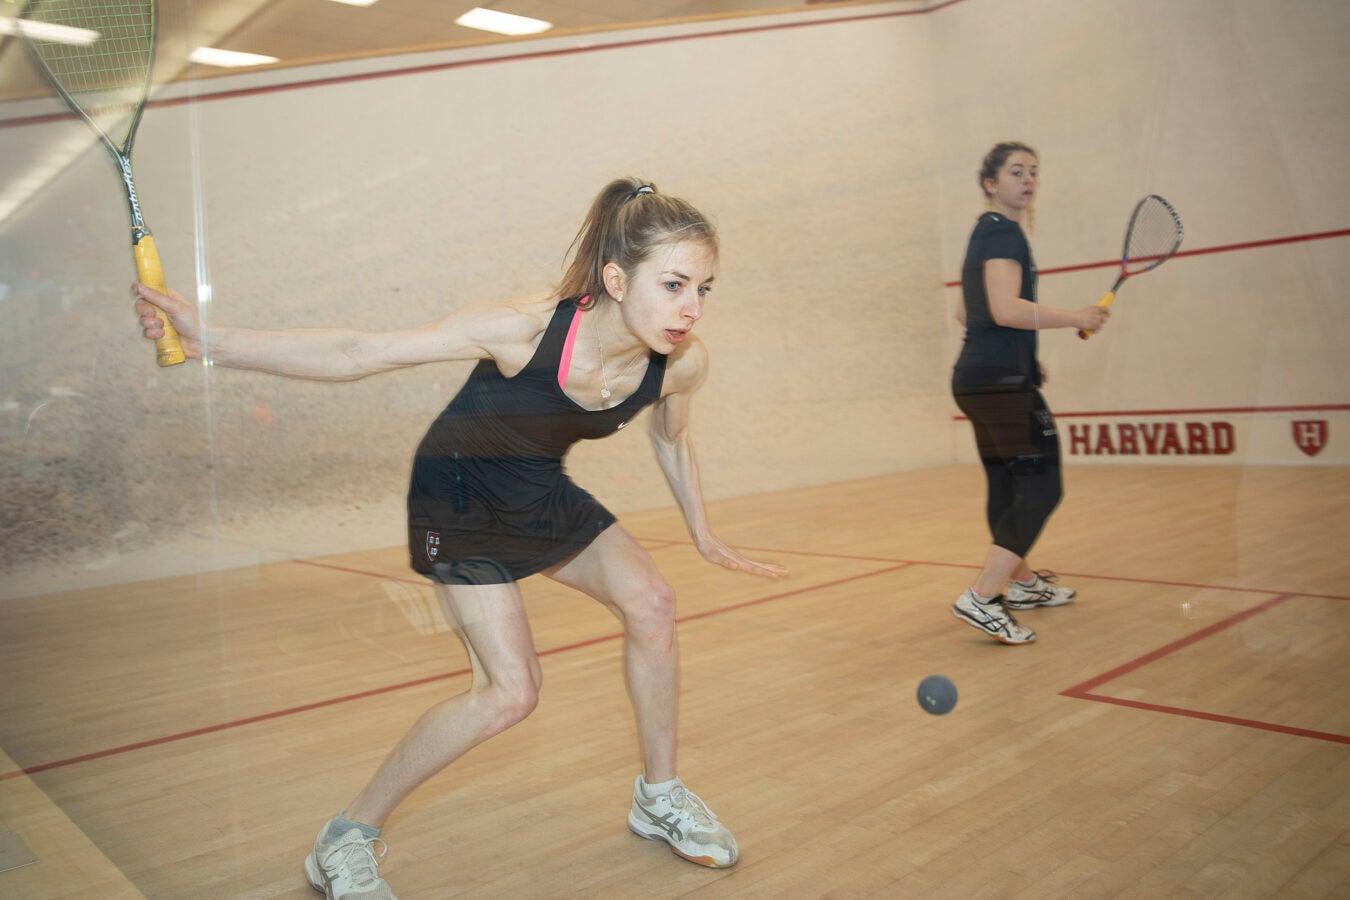 Amelia Henley holds a squash racket.